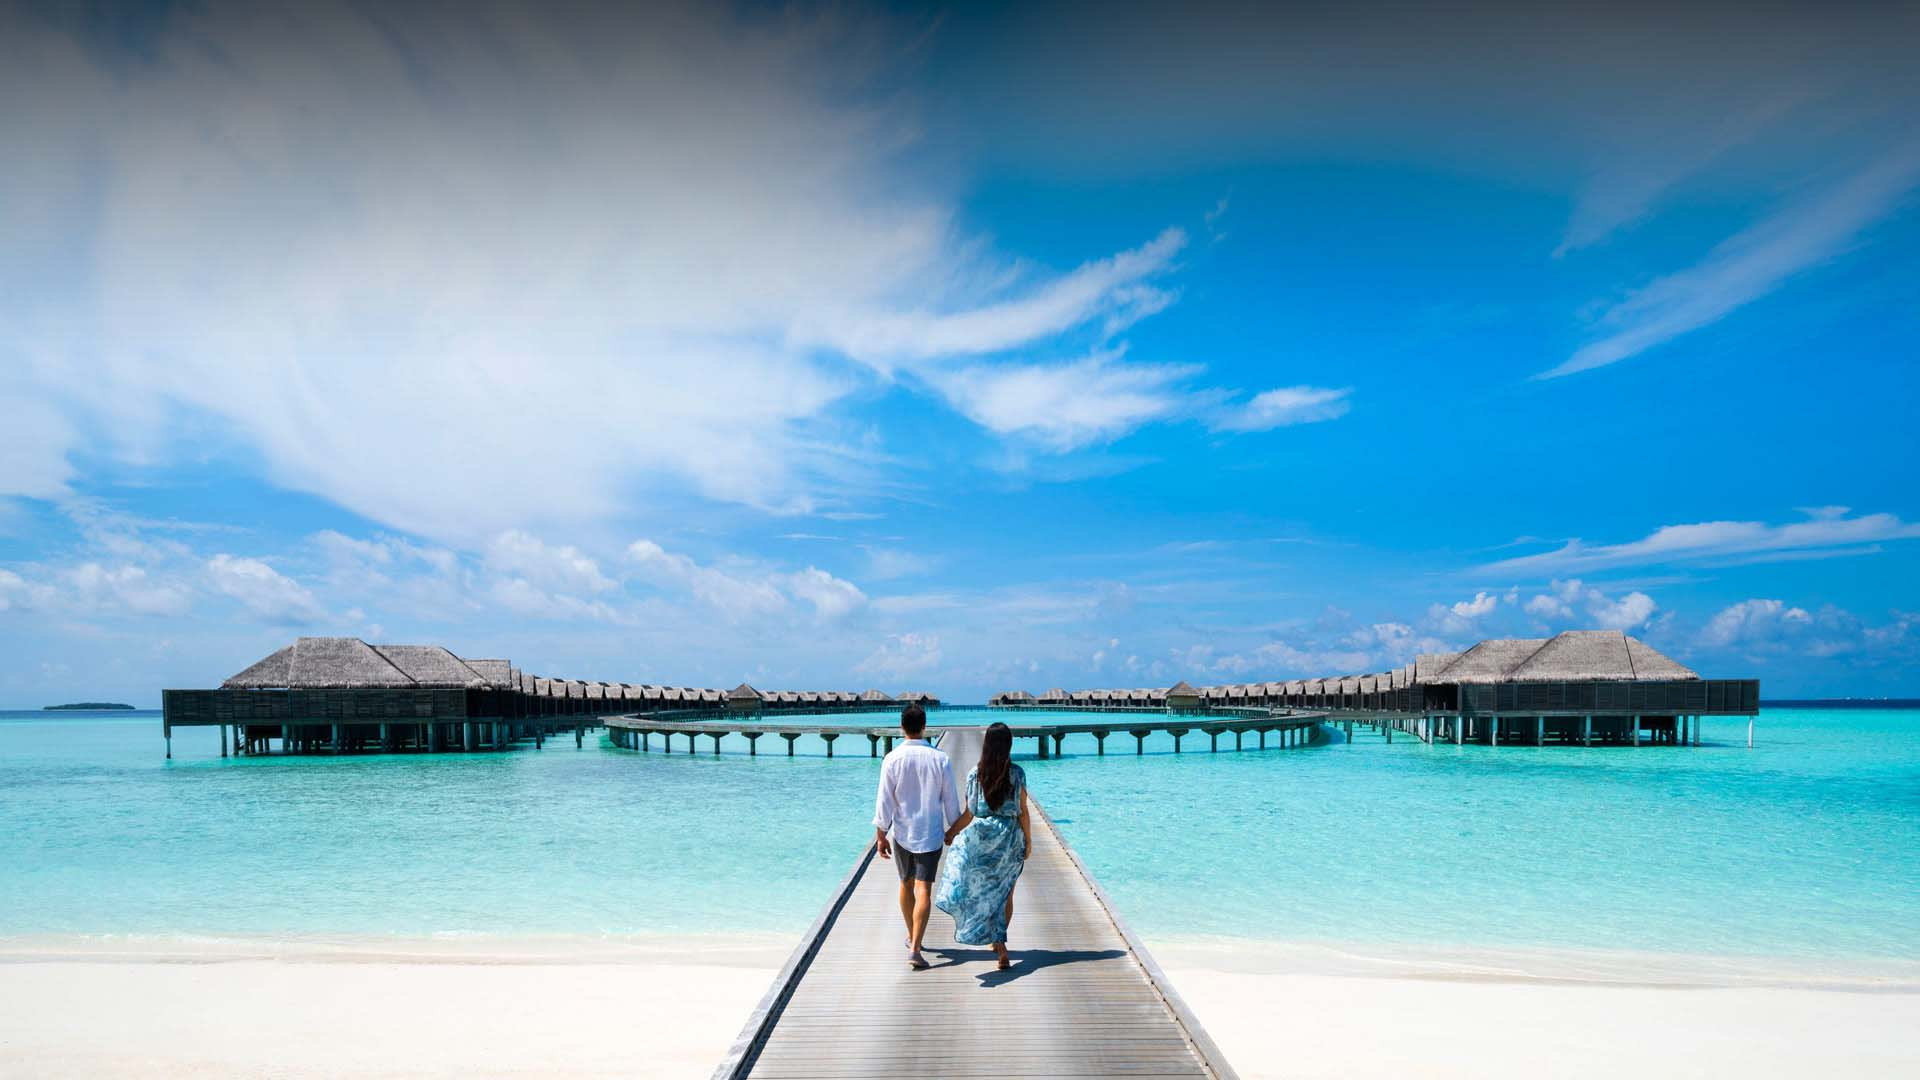 Luxury Resort Maldives Anantara Kihavah Maldives Villas Official Site